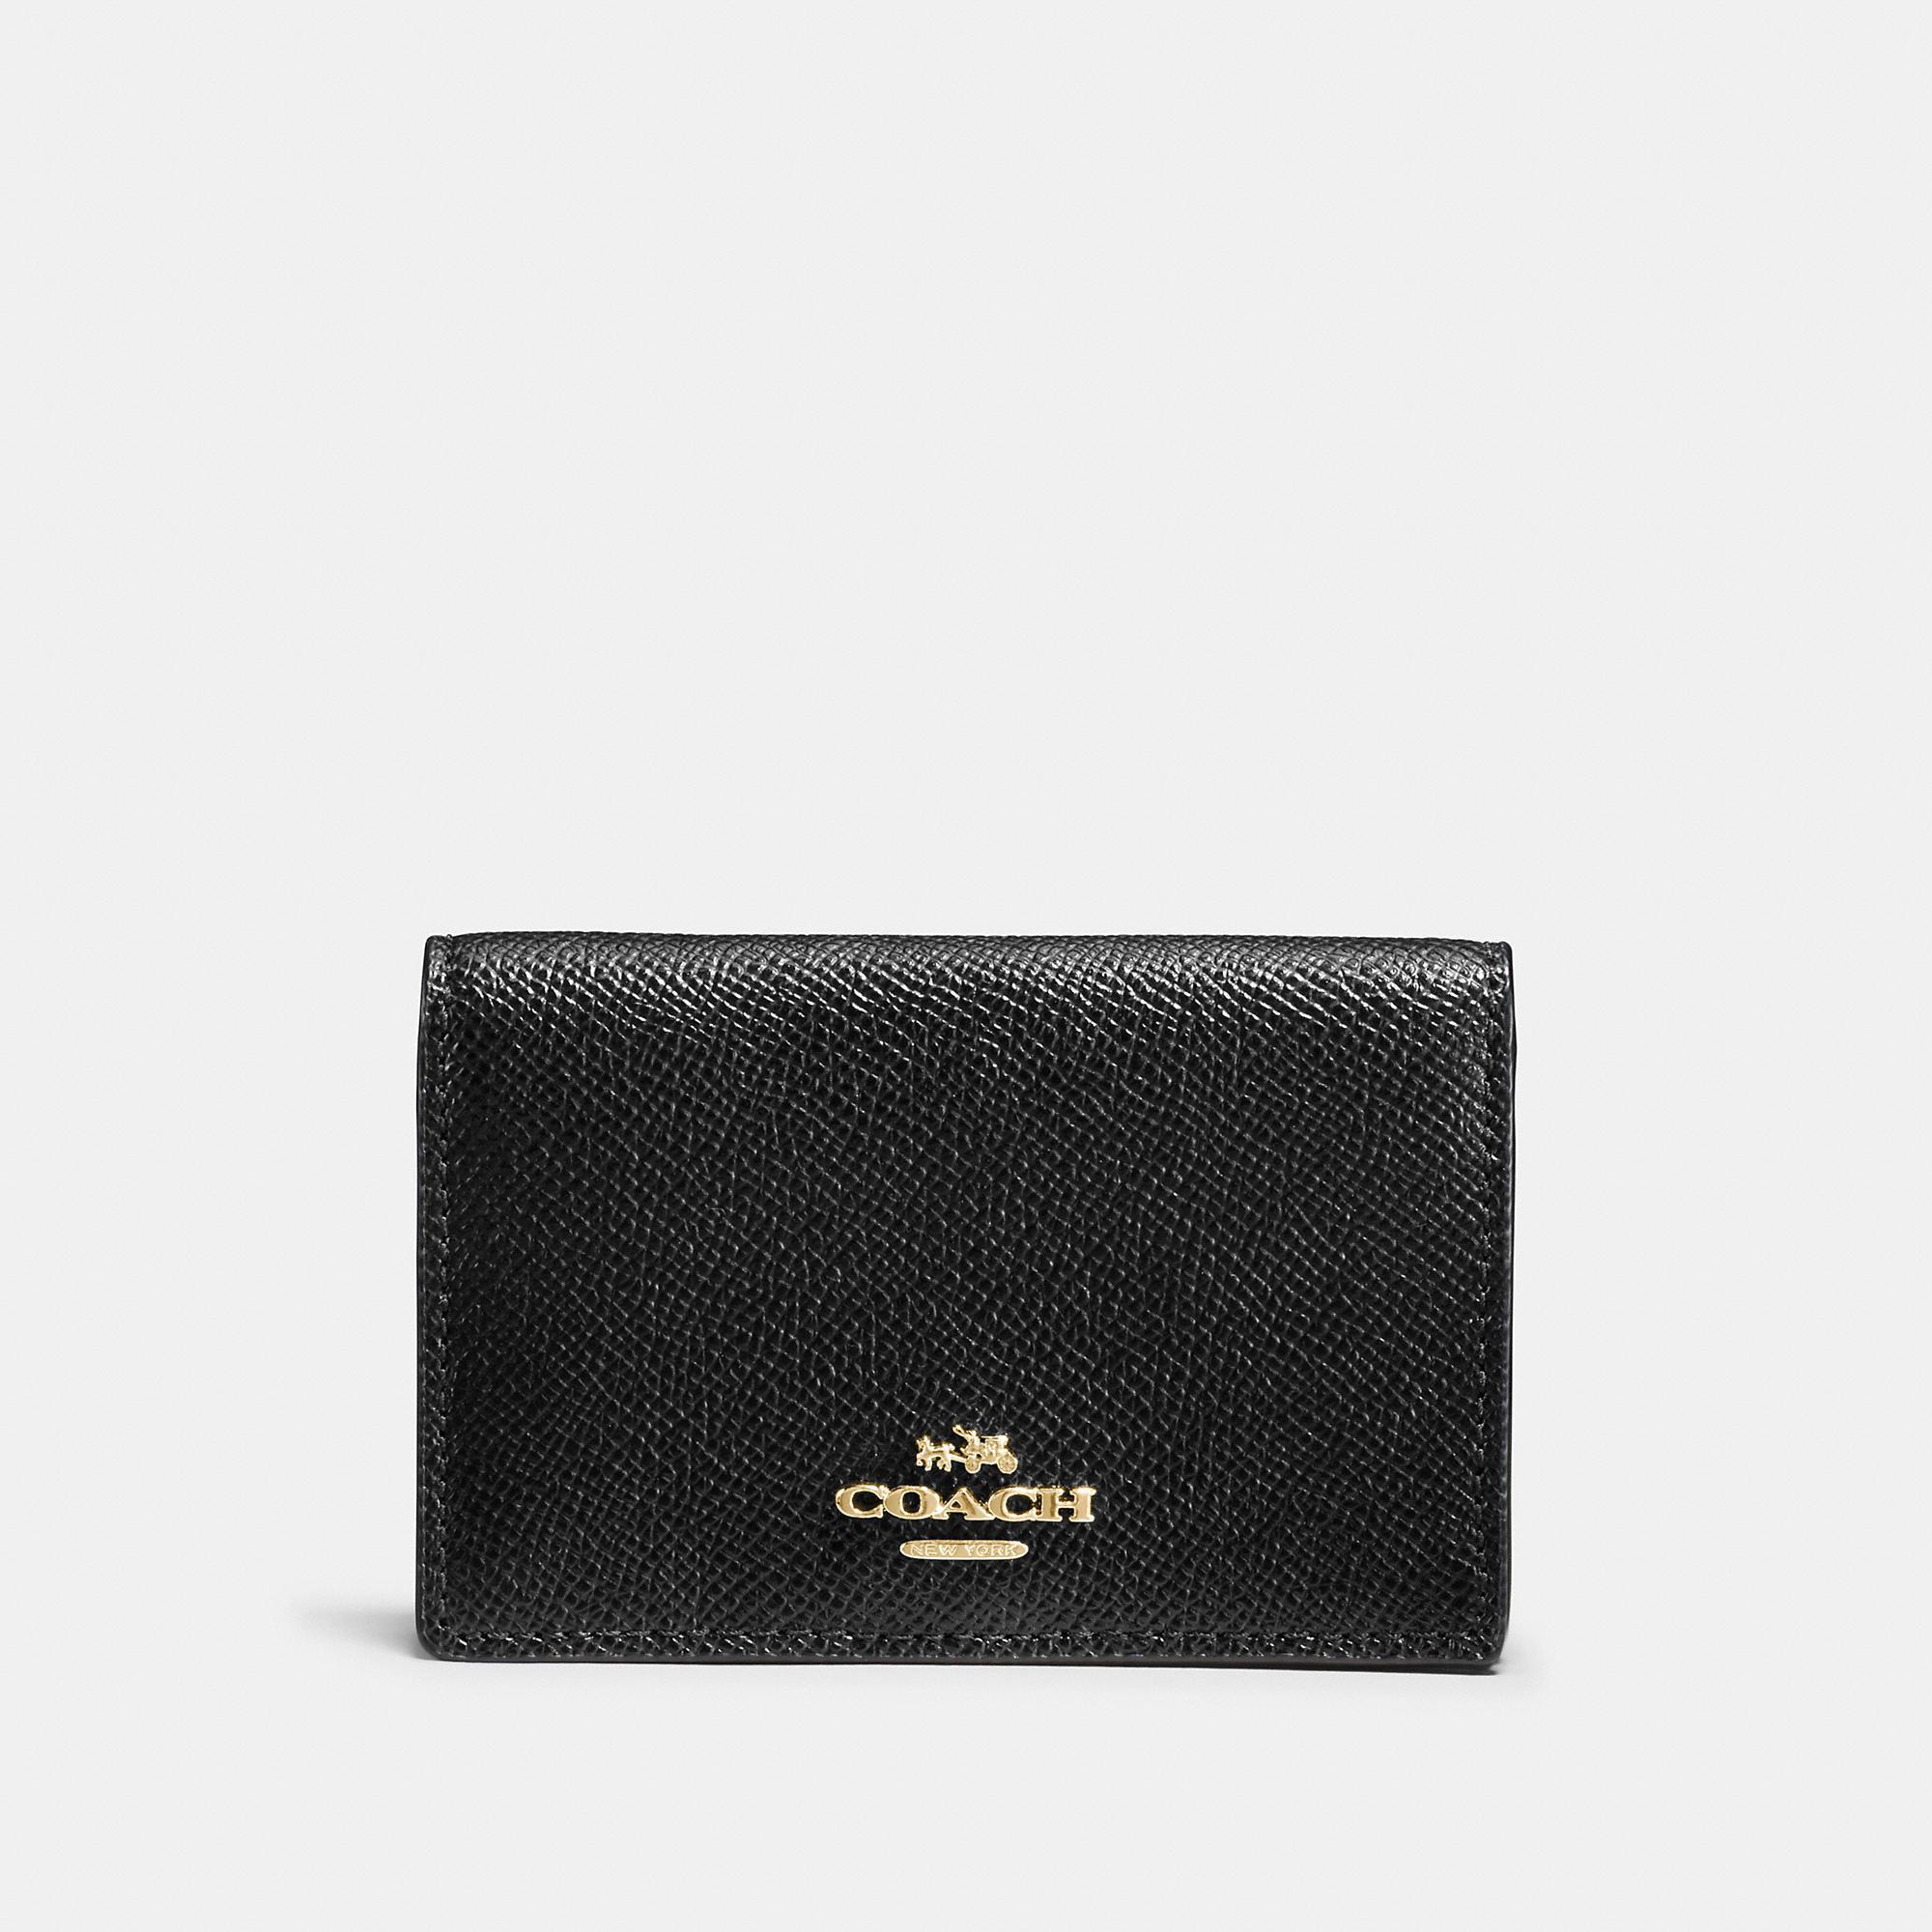 08308bda139bb COACH. Coach Business Card Case - Women s in Black Light Gold